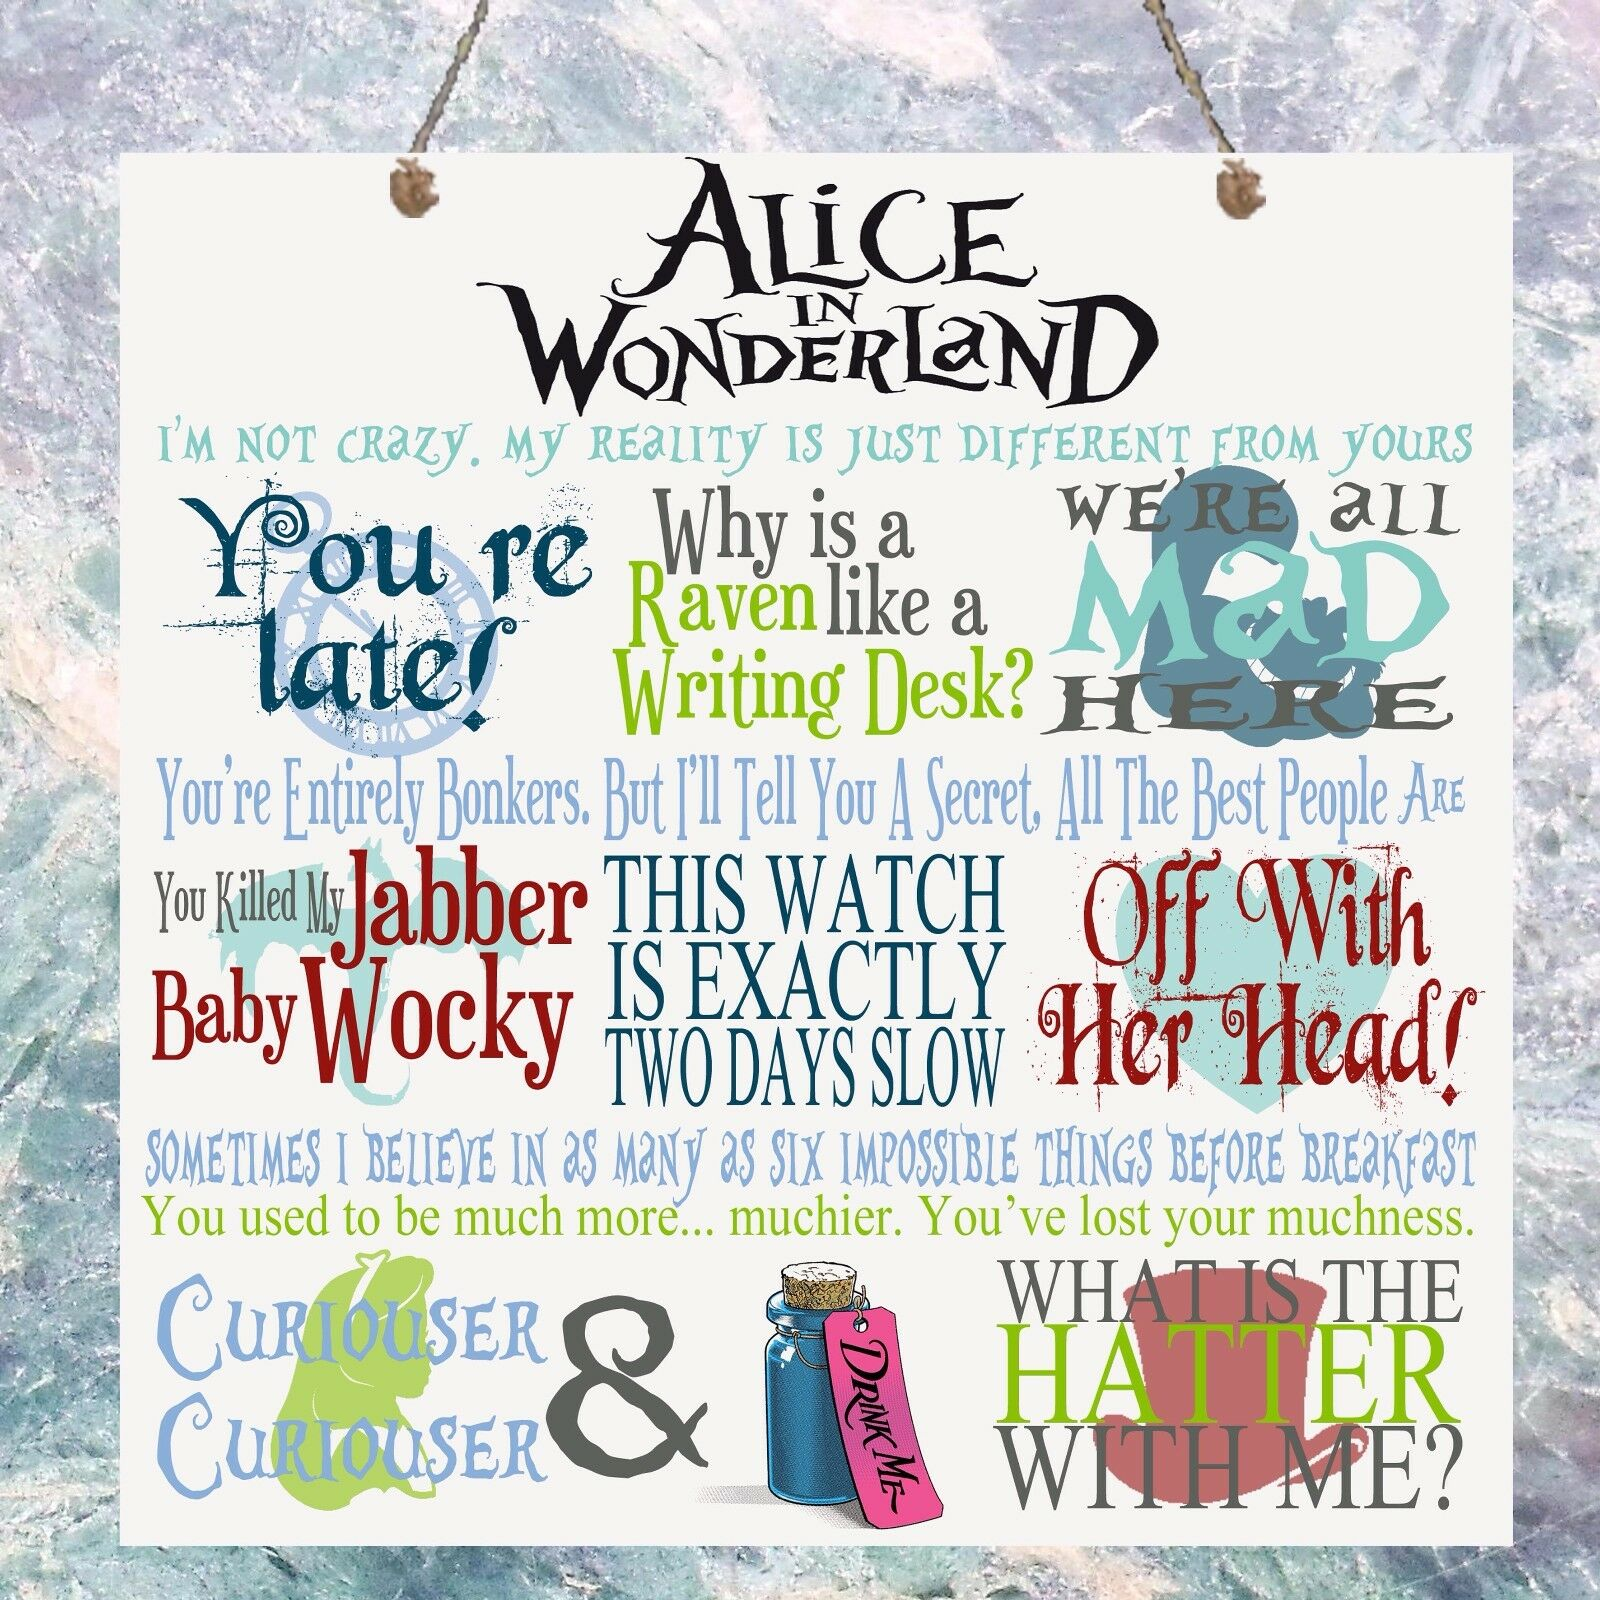 The film Alice in Wonderland. Quotations